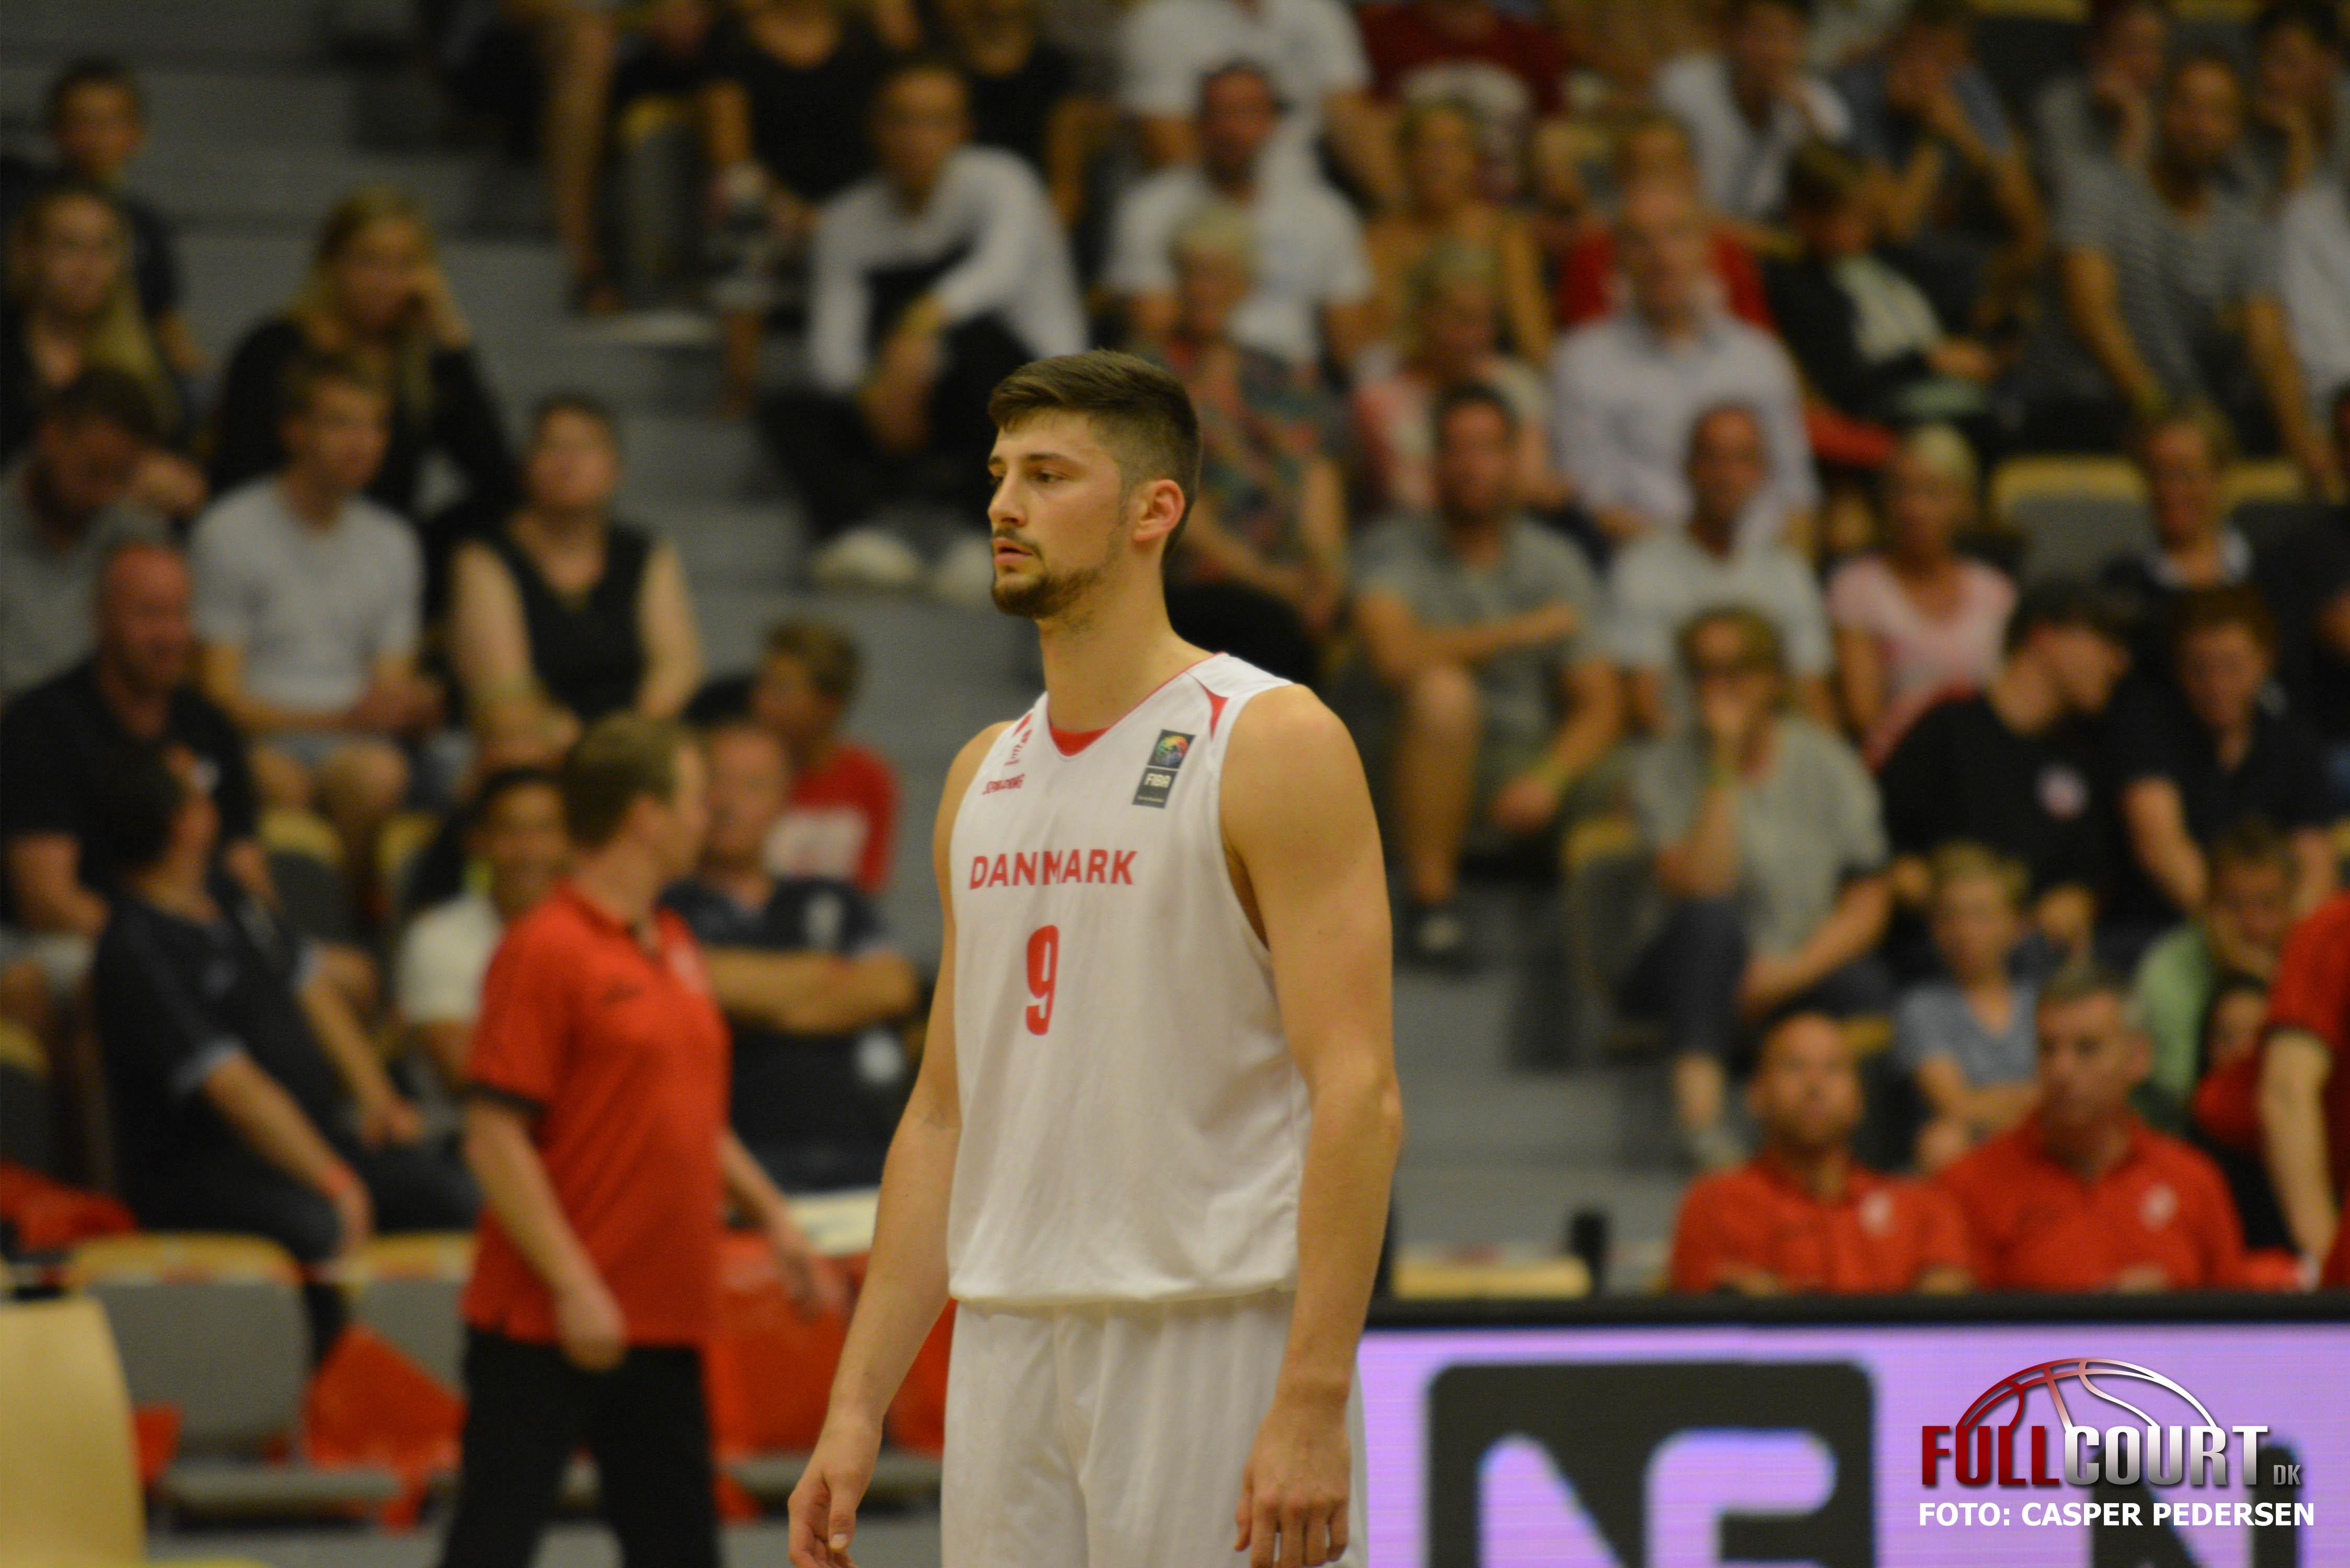 darko-jukic-danmark-eurobasket-2017-kvalifikation-casper-pedersen